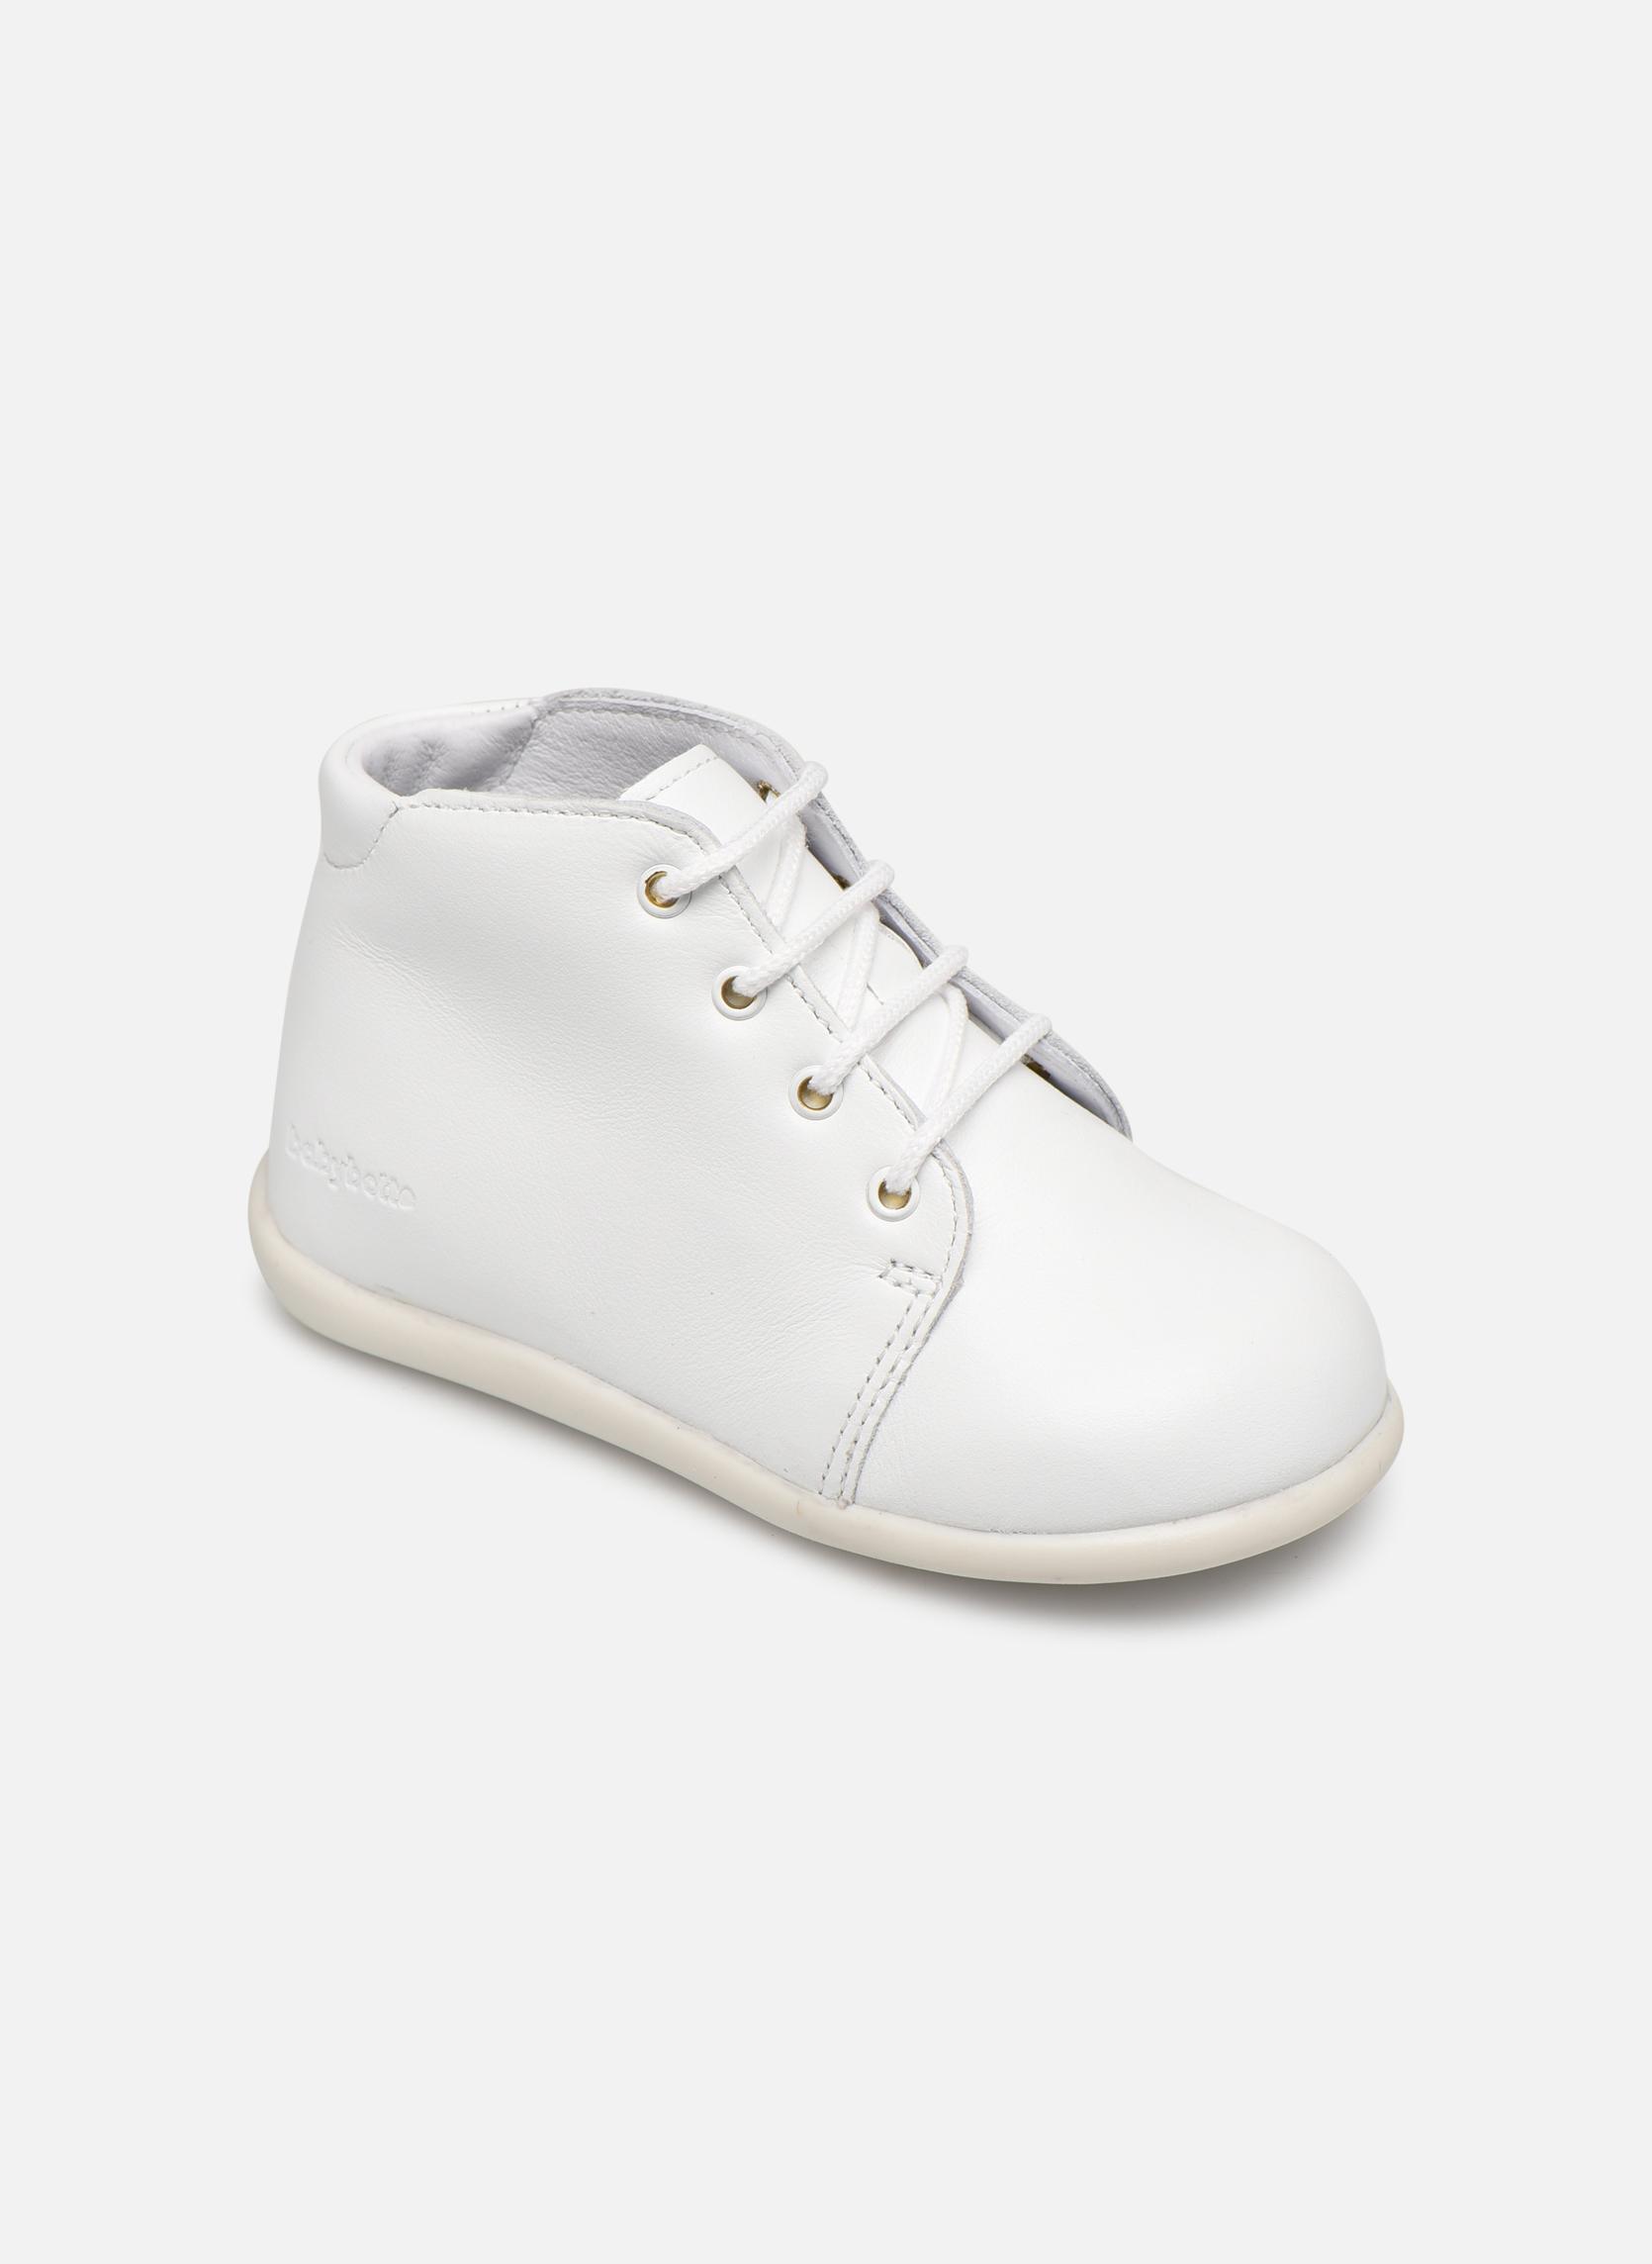 Boots en enkellaarsjes Babybotte Wit